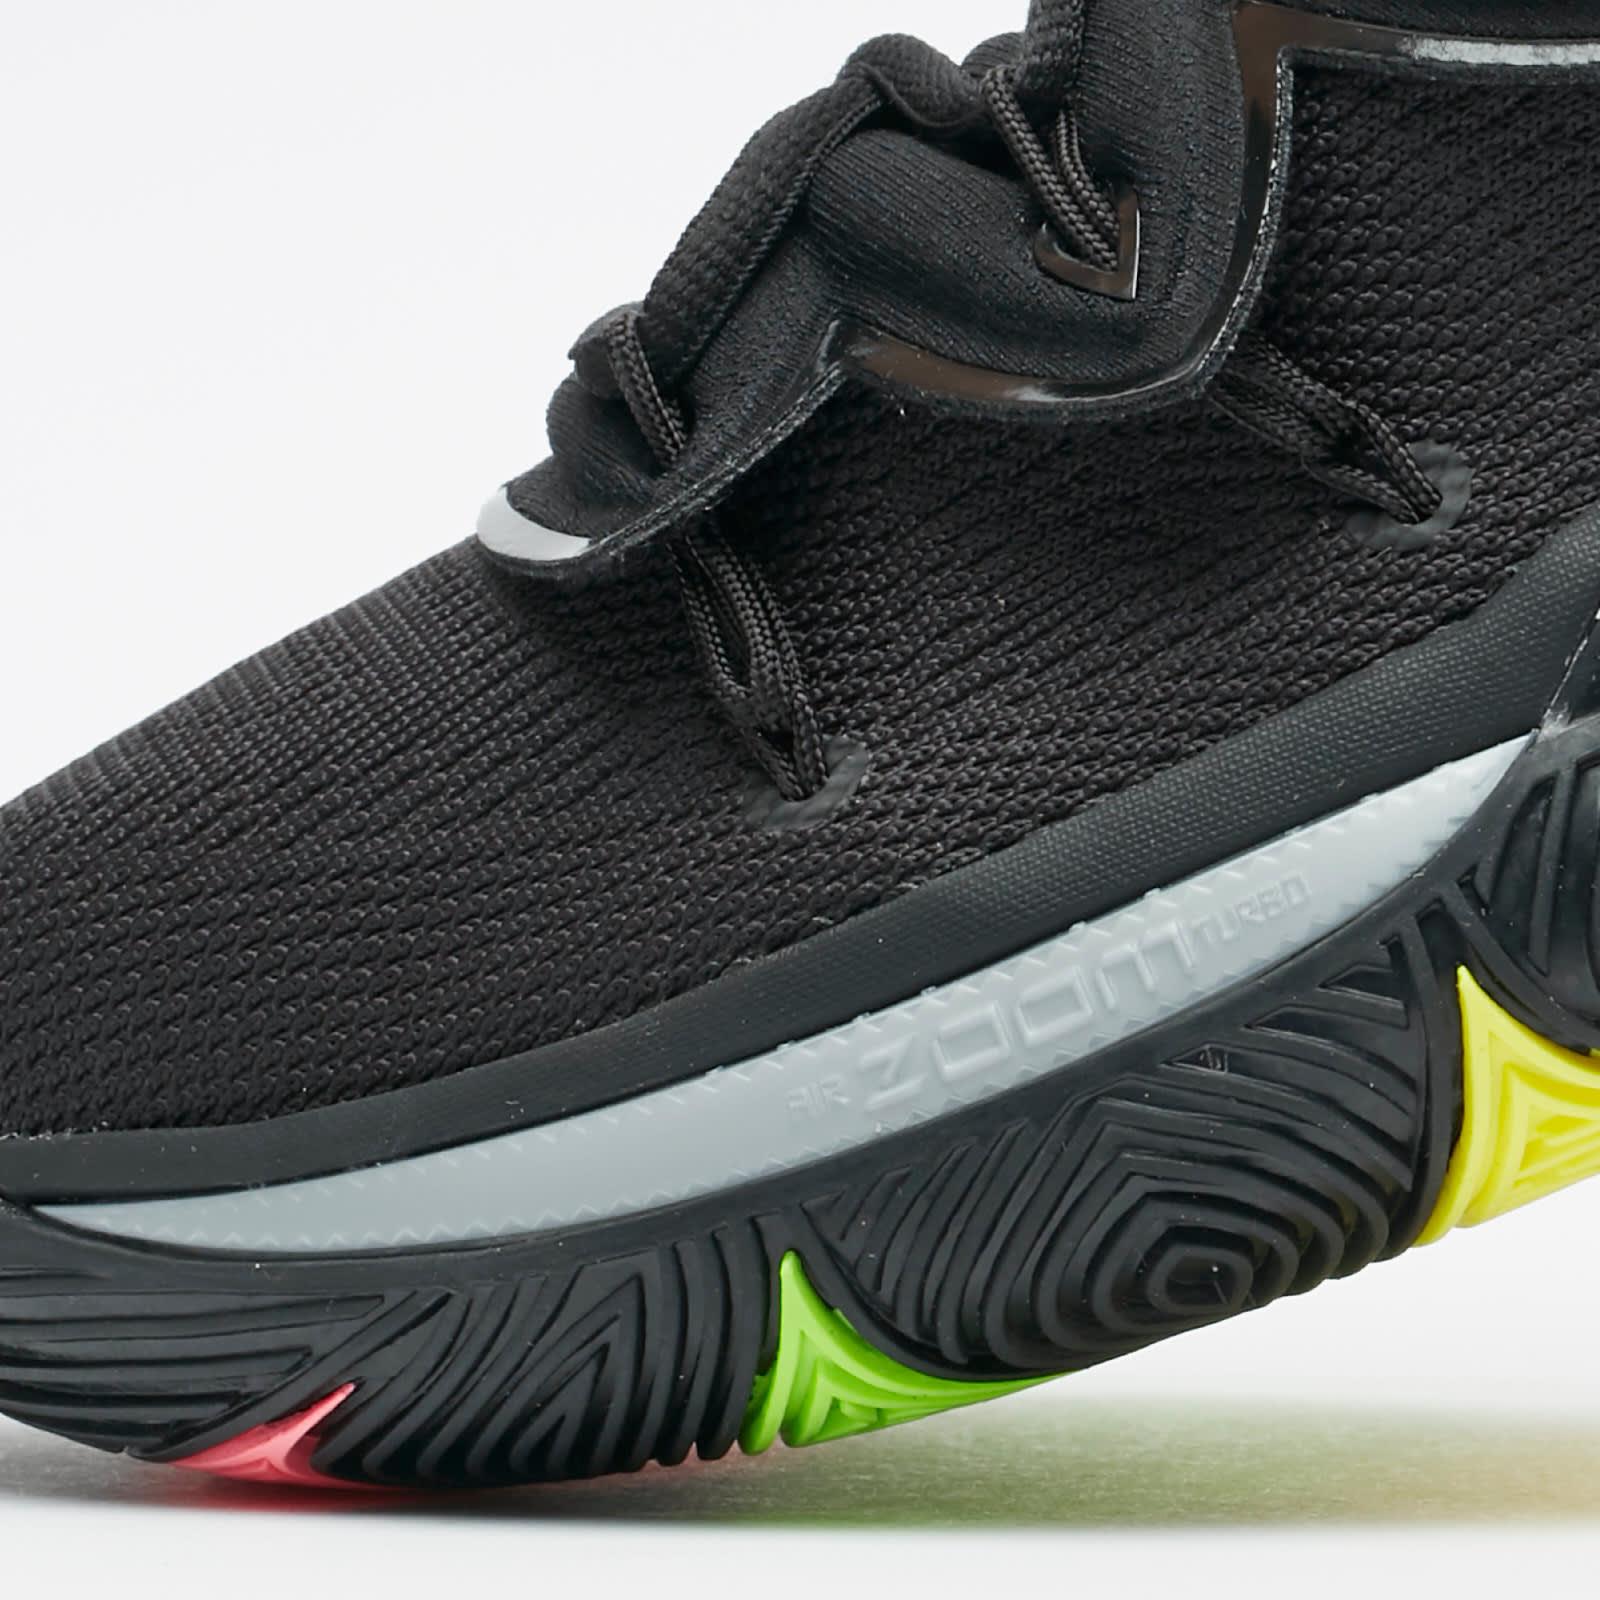 Nike Kyrie 5 Black Rainbow Release Date AO2918-001 Midsole